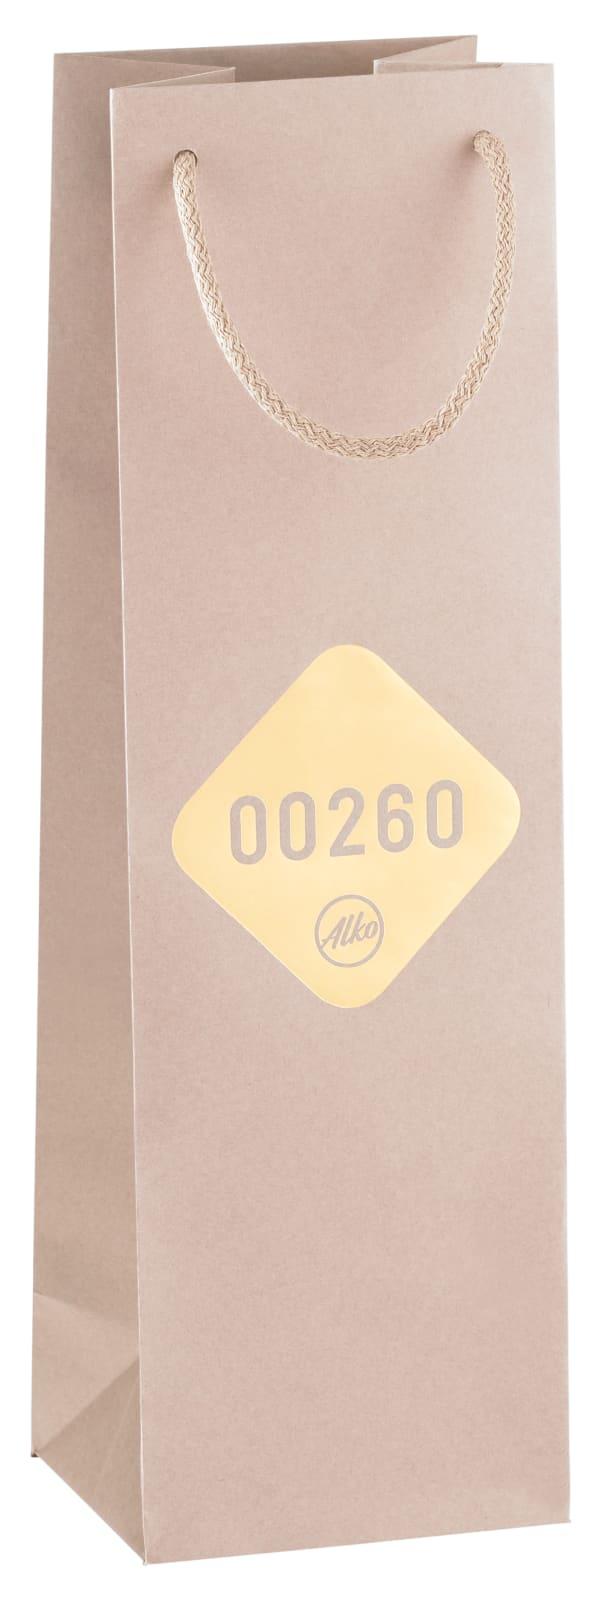 Presentpåse 00260 guld